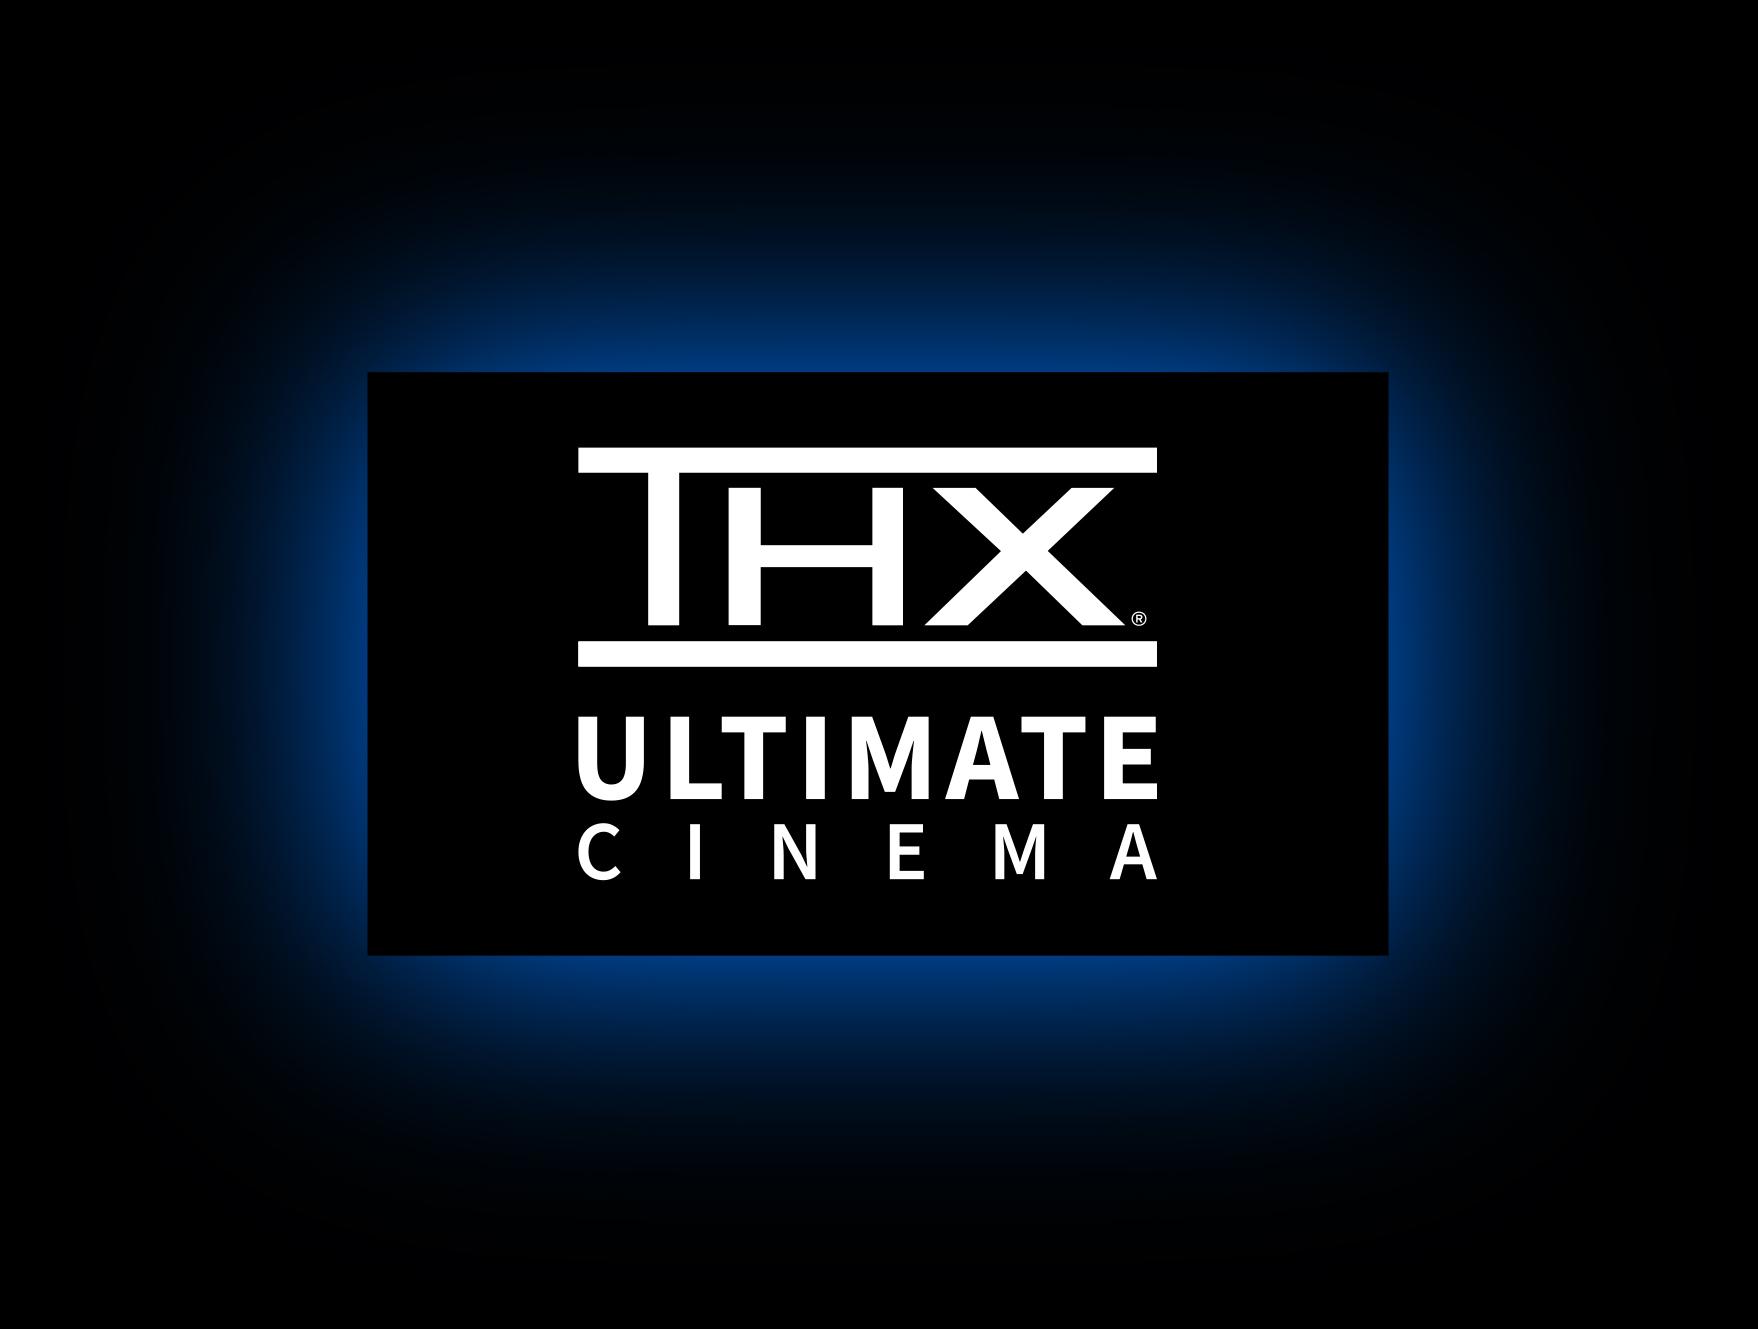 THX ULTIMATE CINEMA